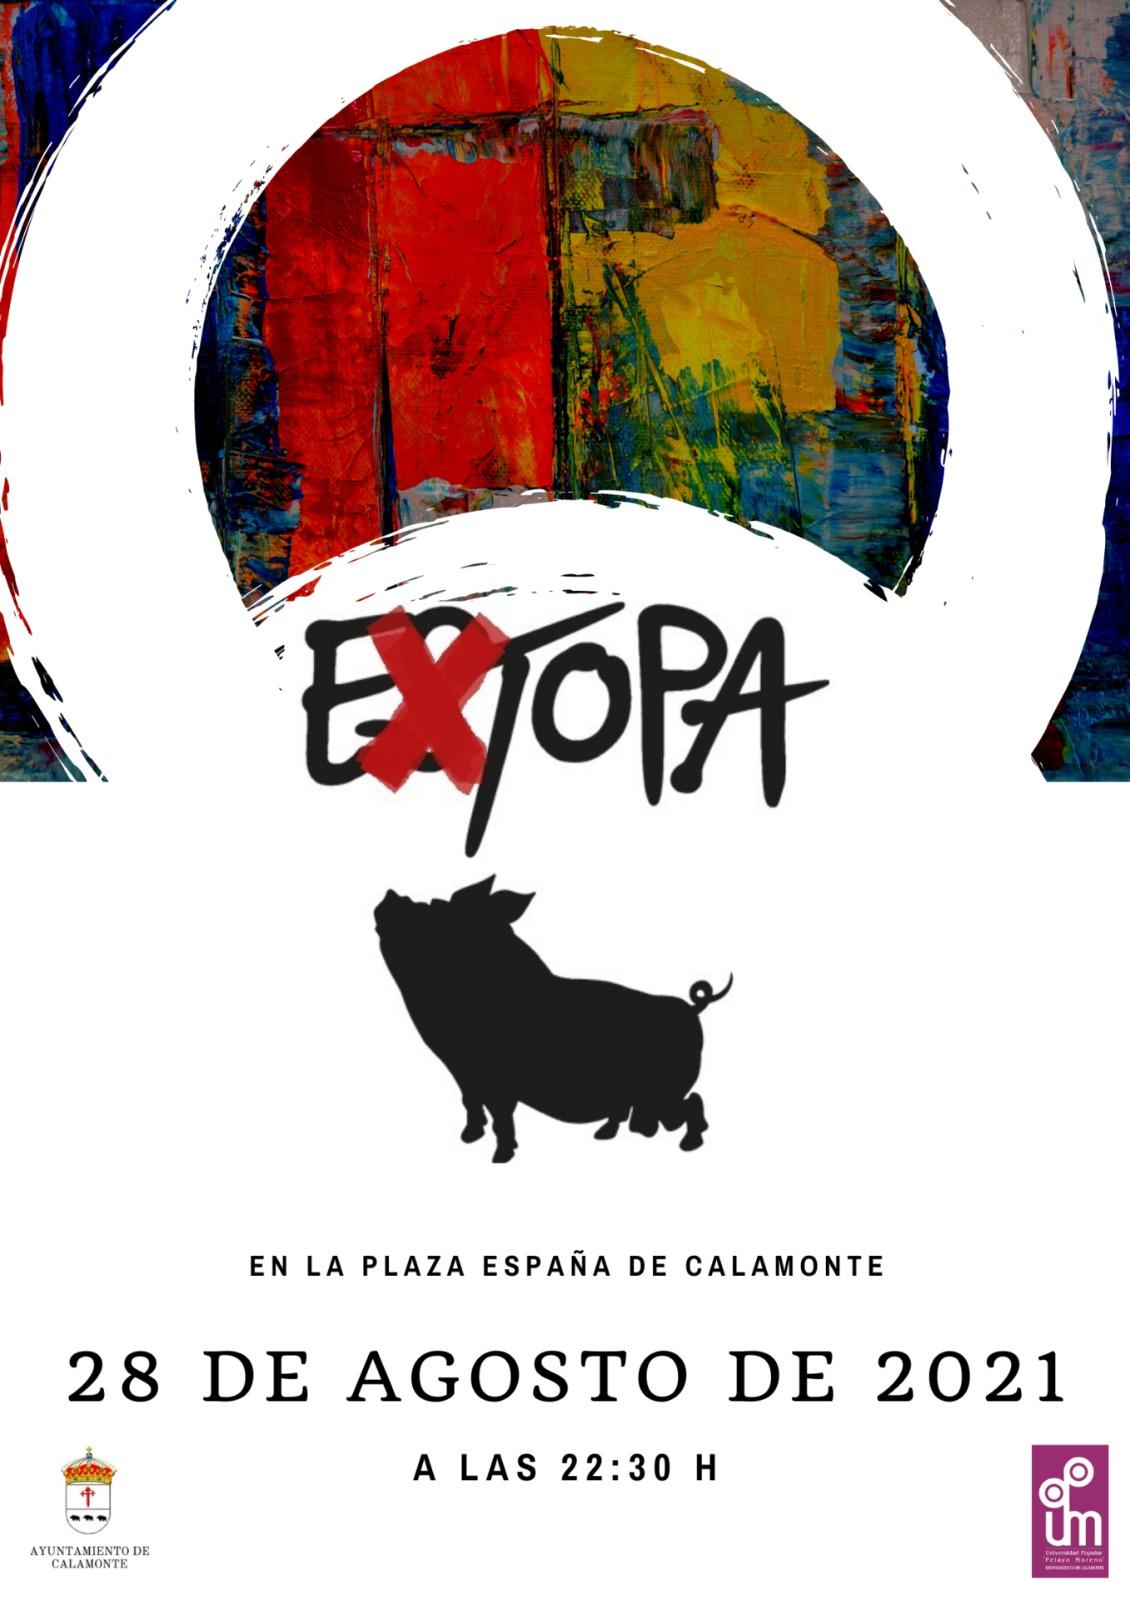 Extopa tributo a Extopa este fin de Semana en Calamonte y Aldea en Cabo